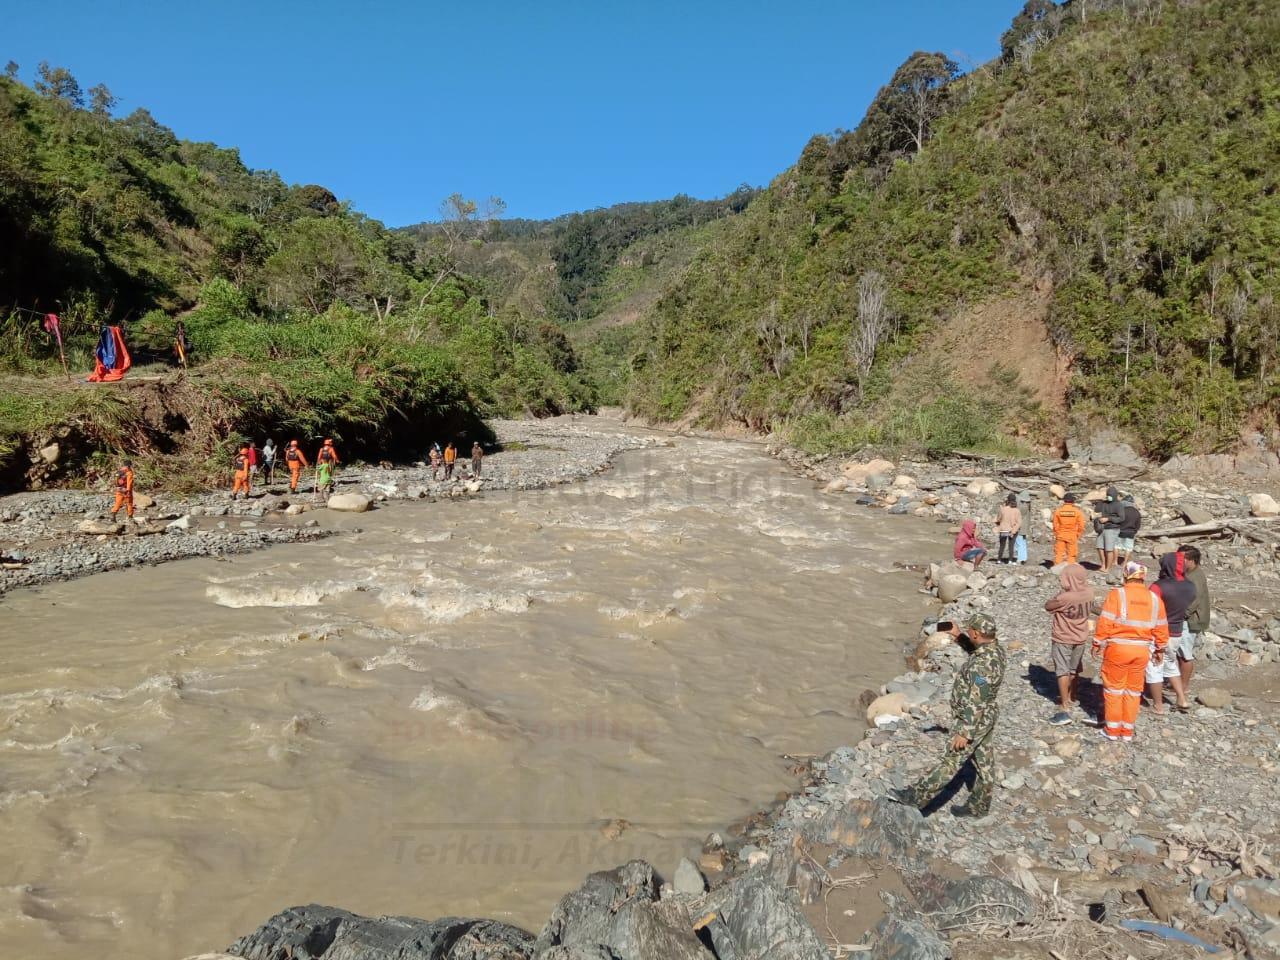 Basarnas Cari Warga Manokwari Terseret Arus di Sungai Didohu 19 IMG 20210315 WA0021